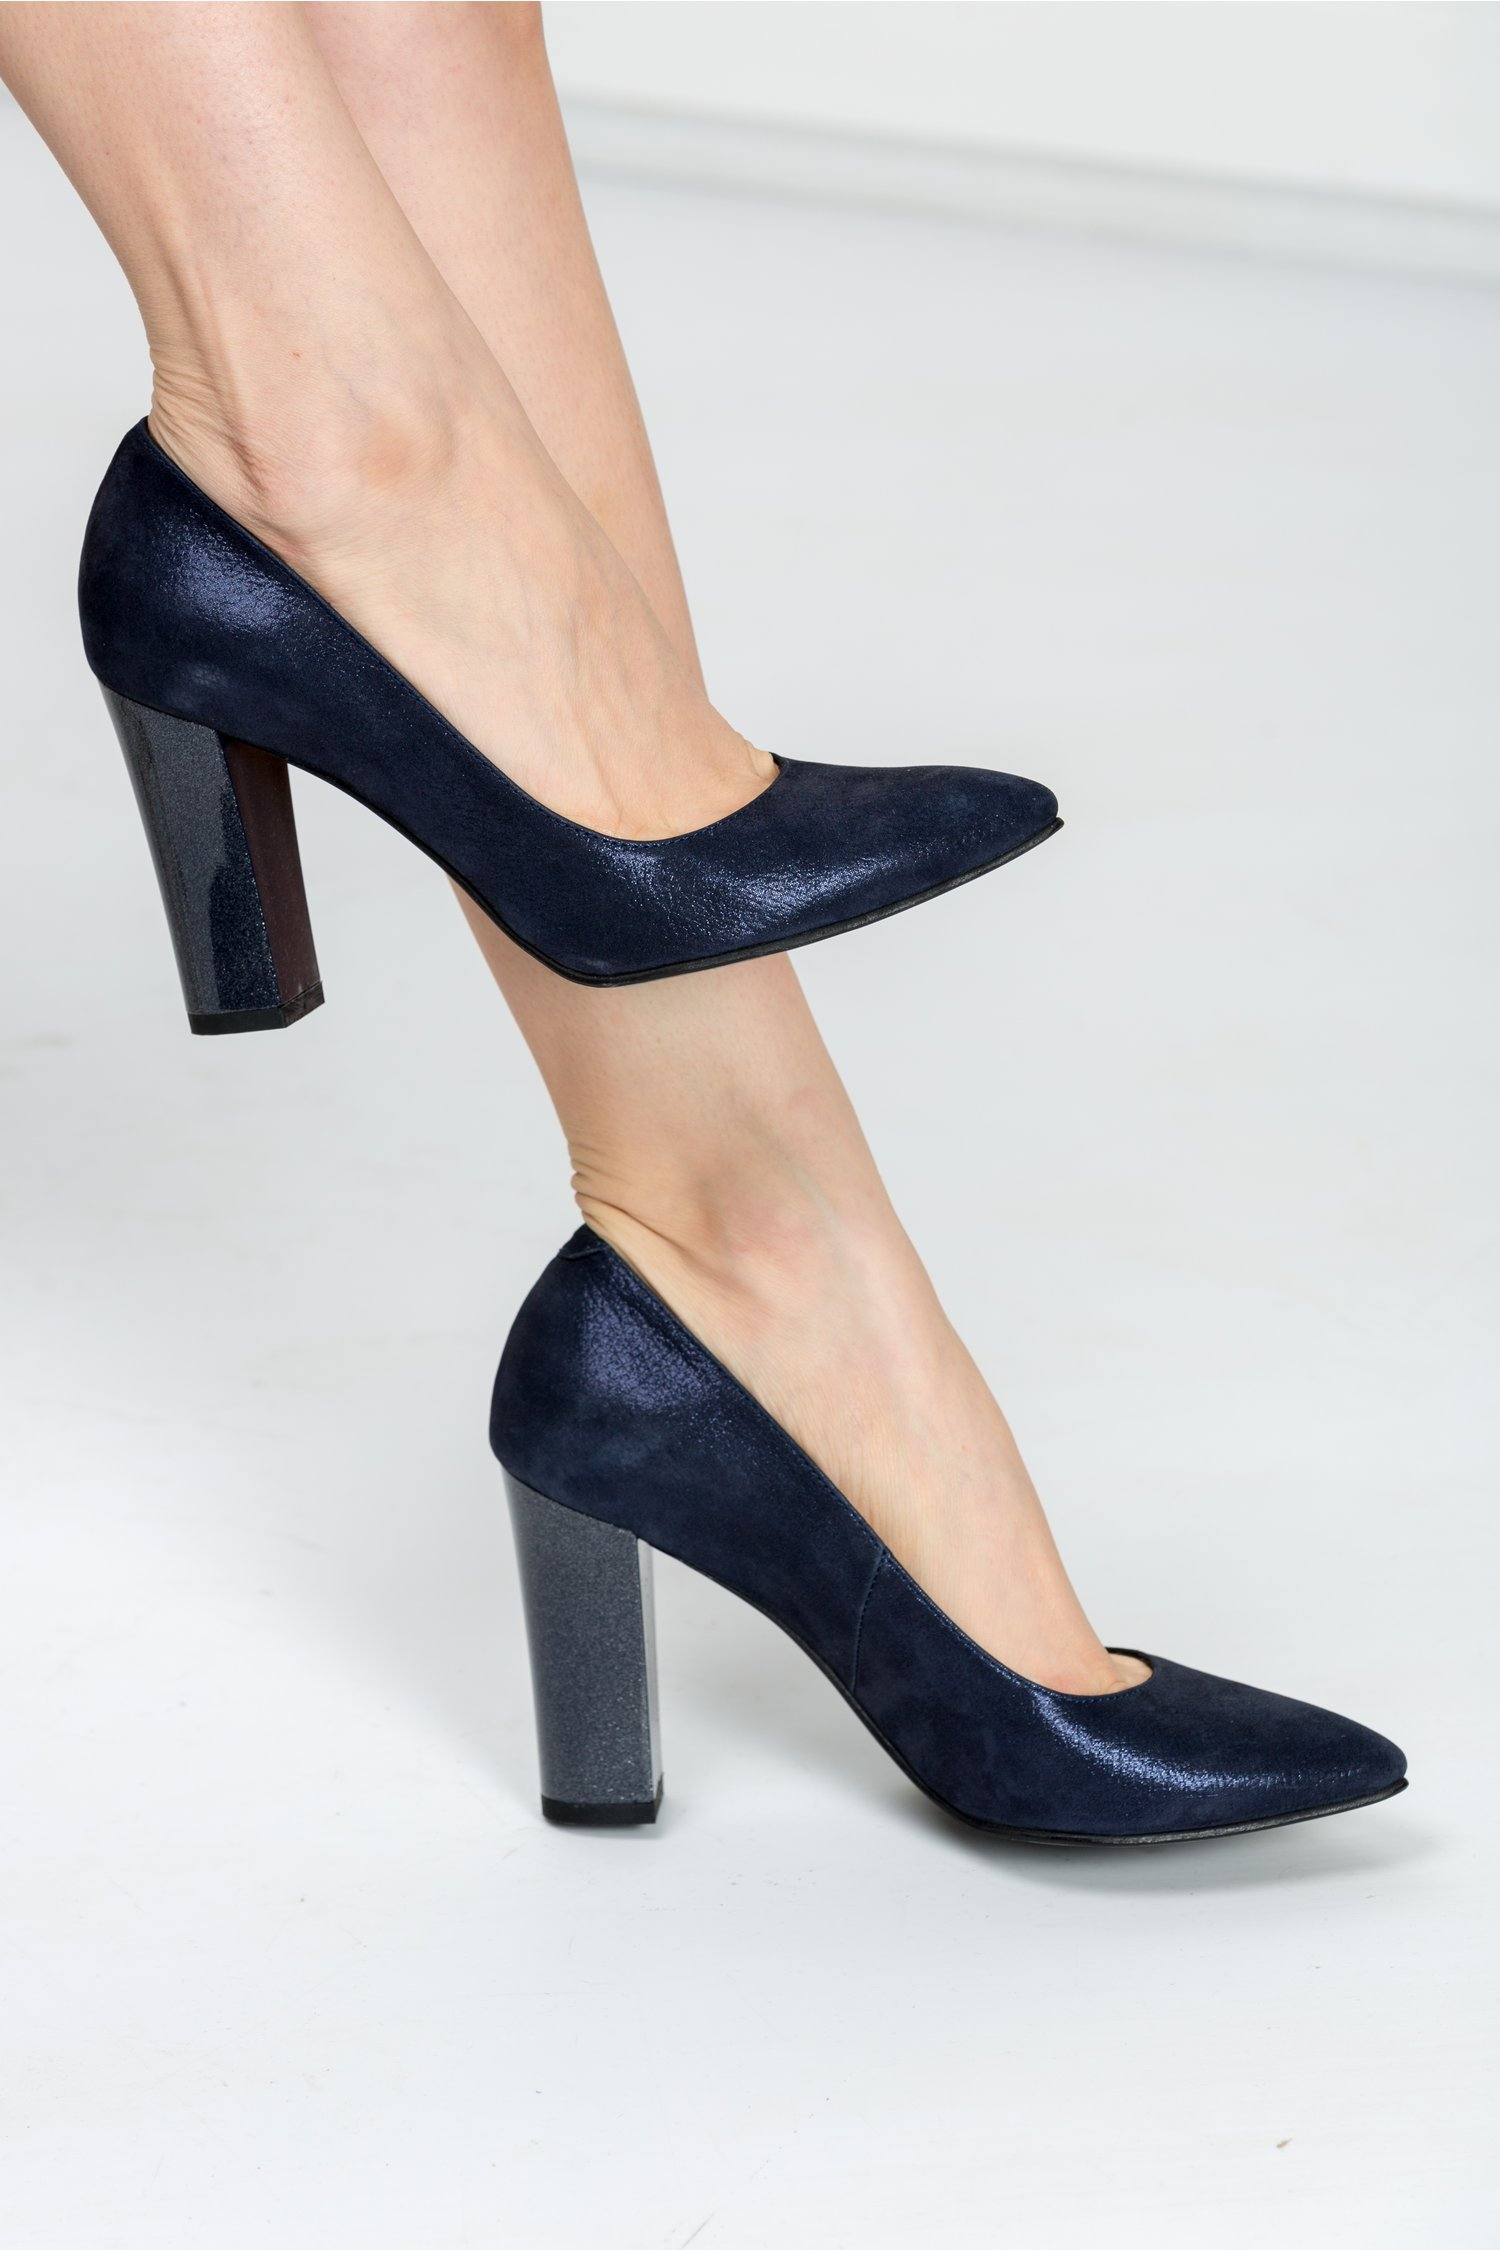 Pantofi Ceren bleumarin sidef de ocazie